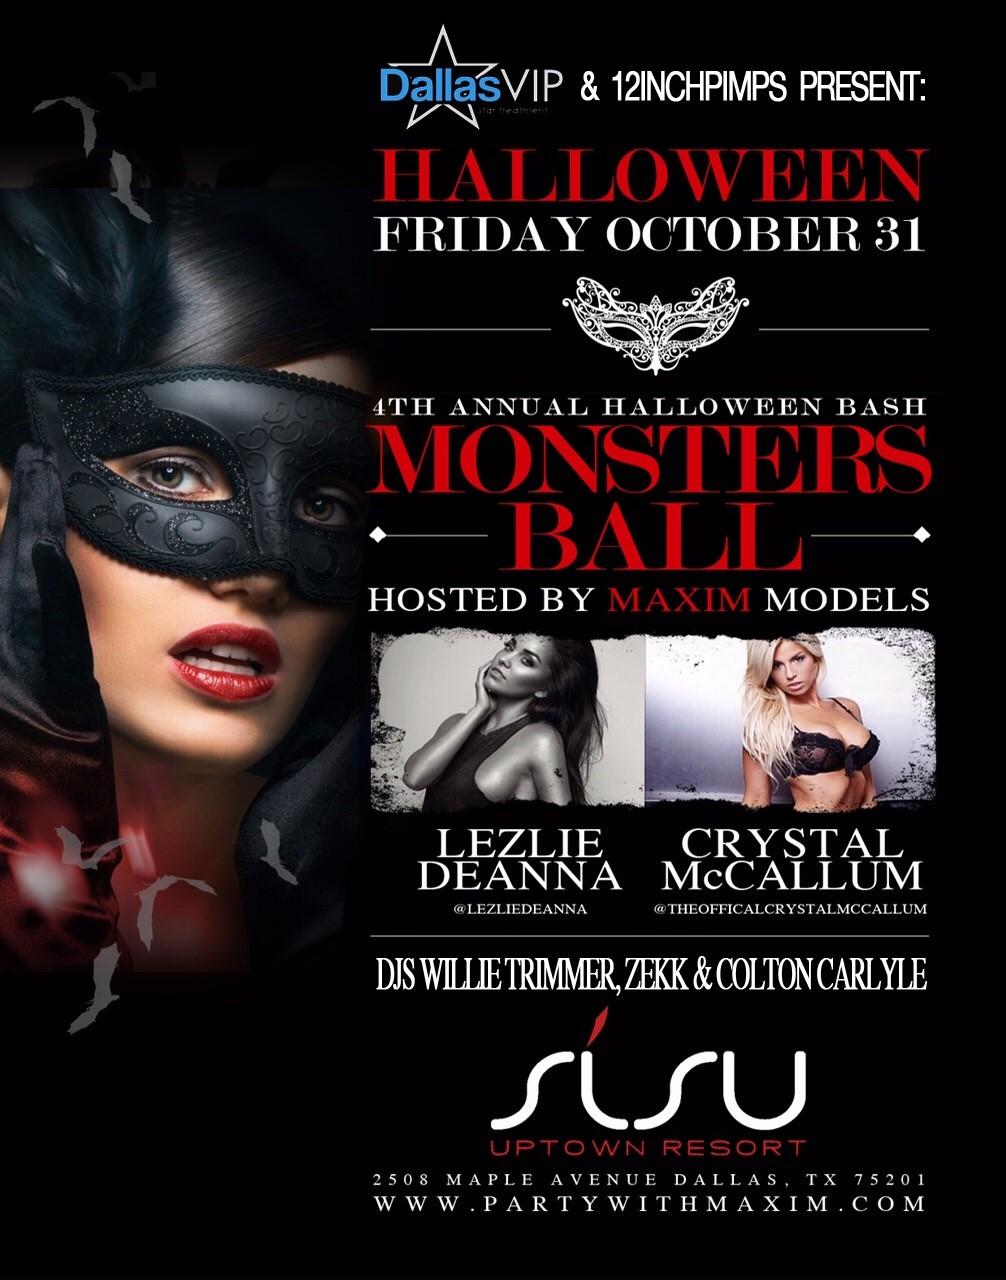 Halloween Party 2014 | Dallas VIP